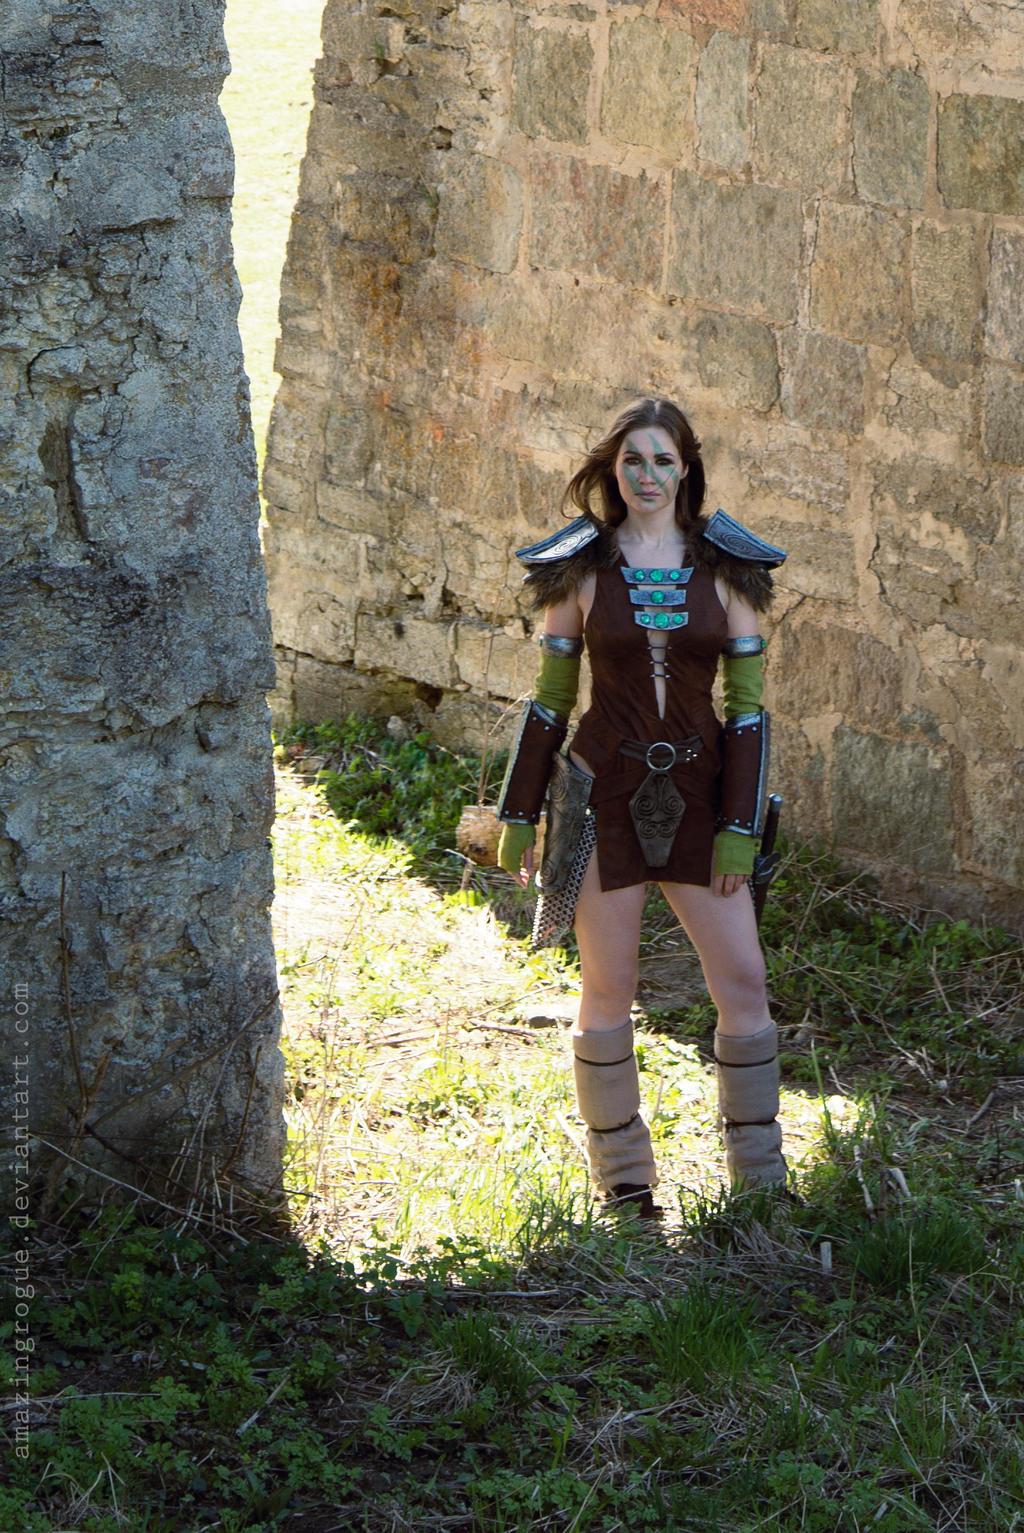 Skyrim, Aela the Huntress by AmazingRogue on DeviantArt